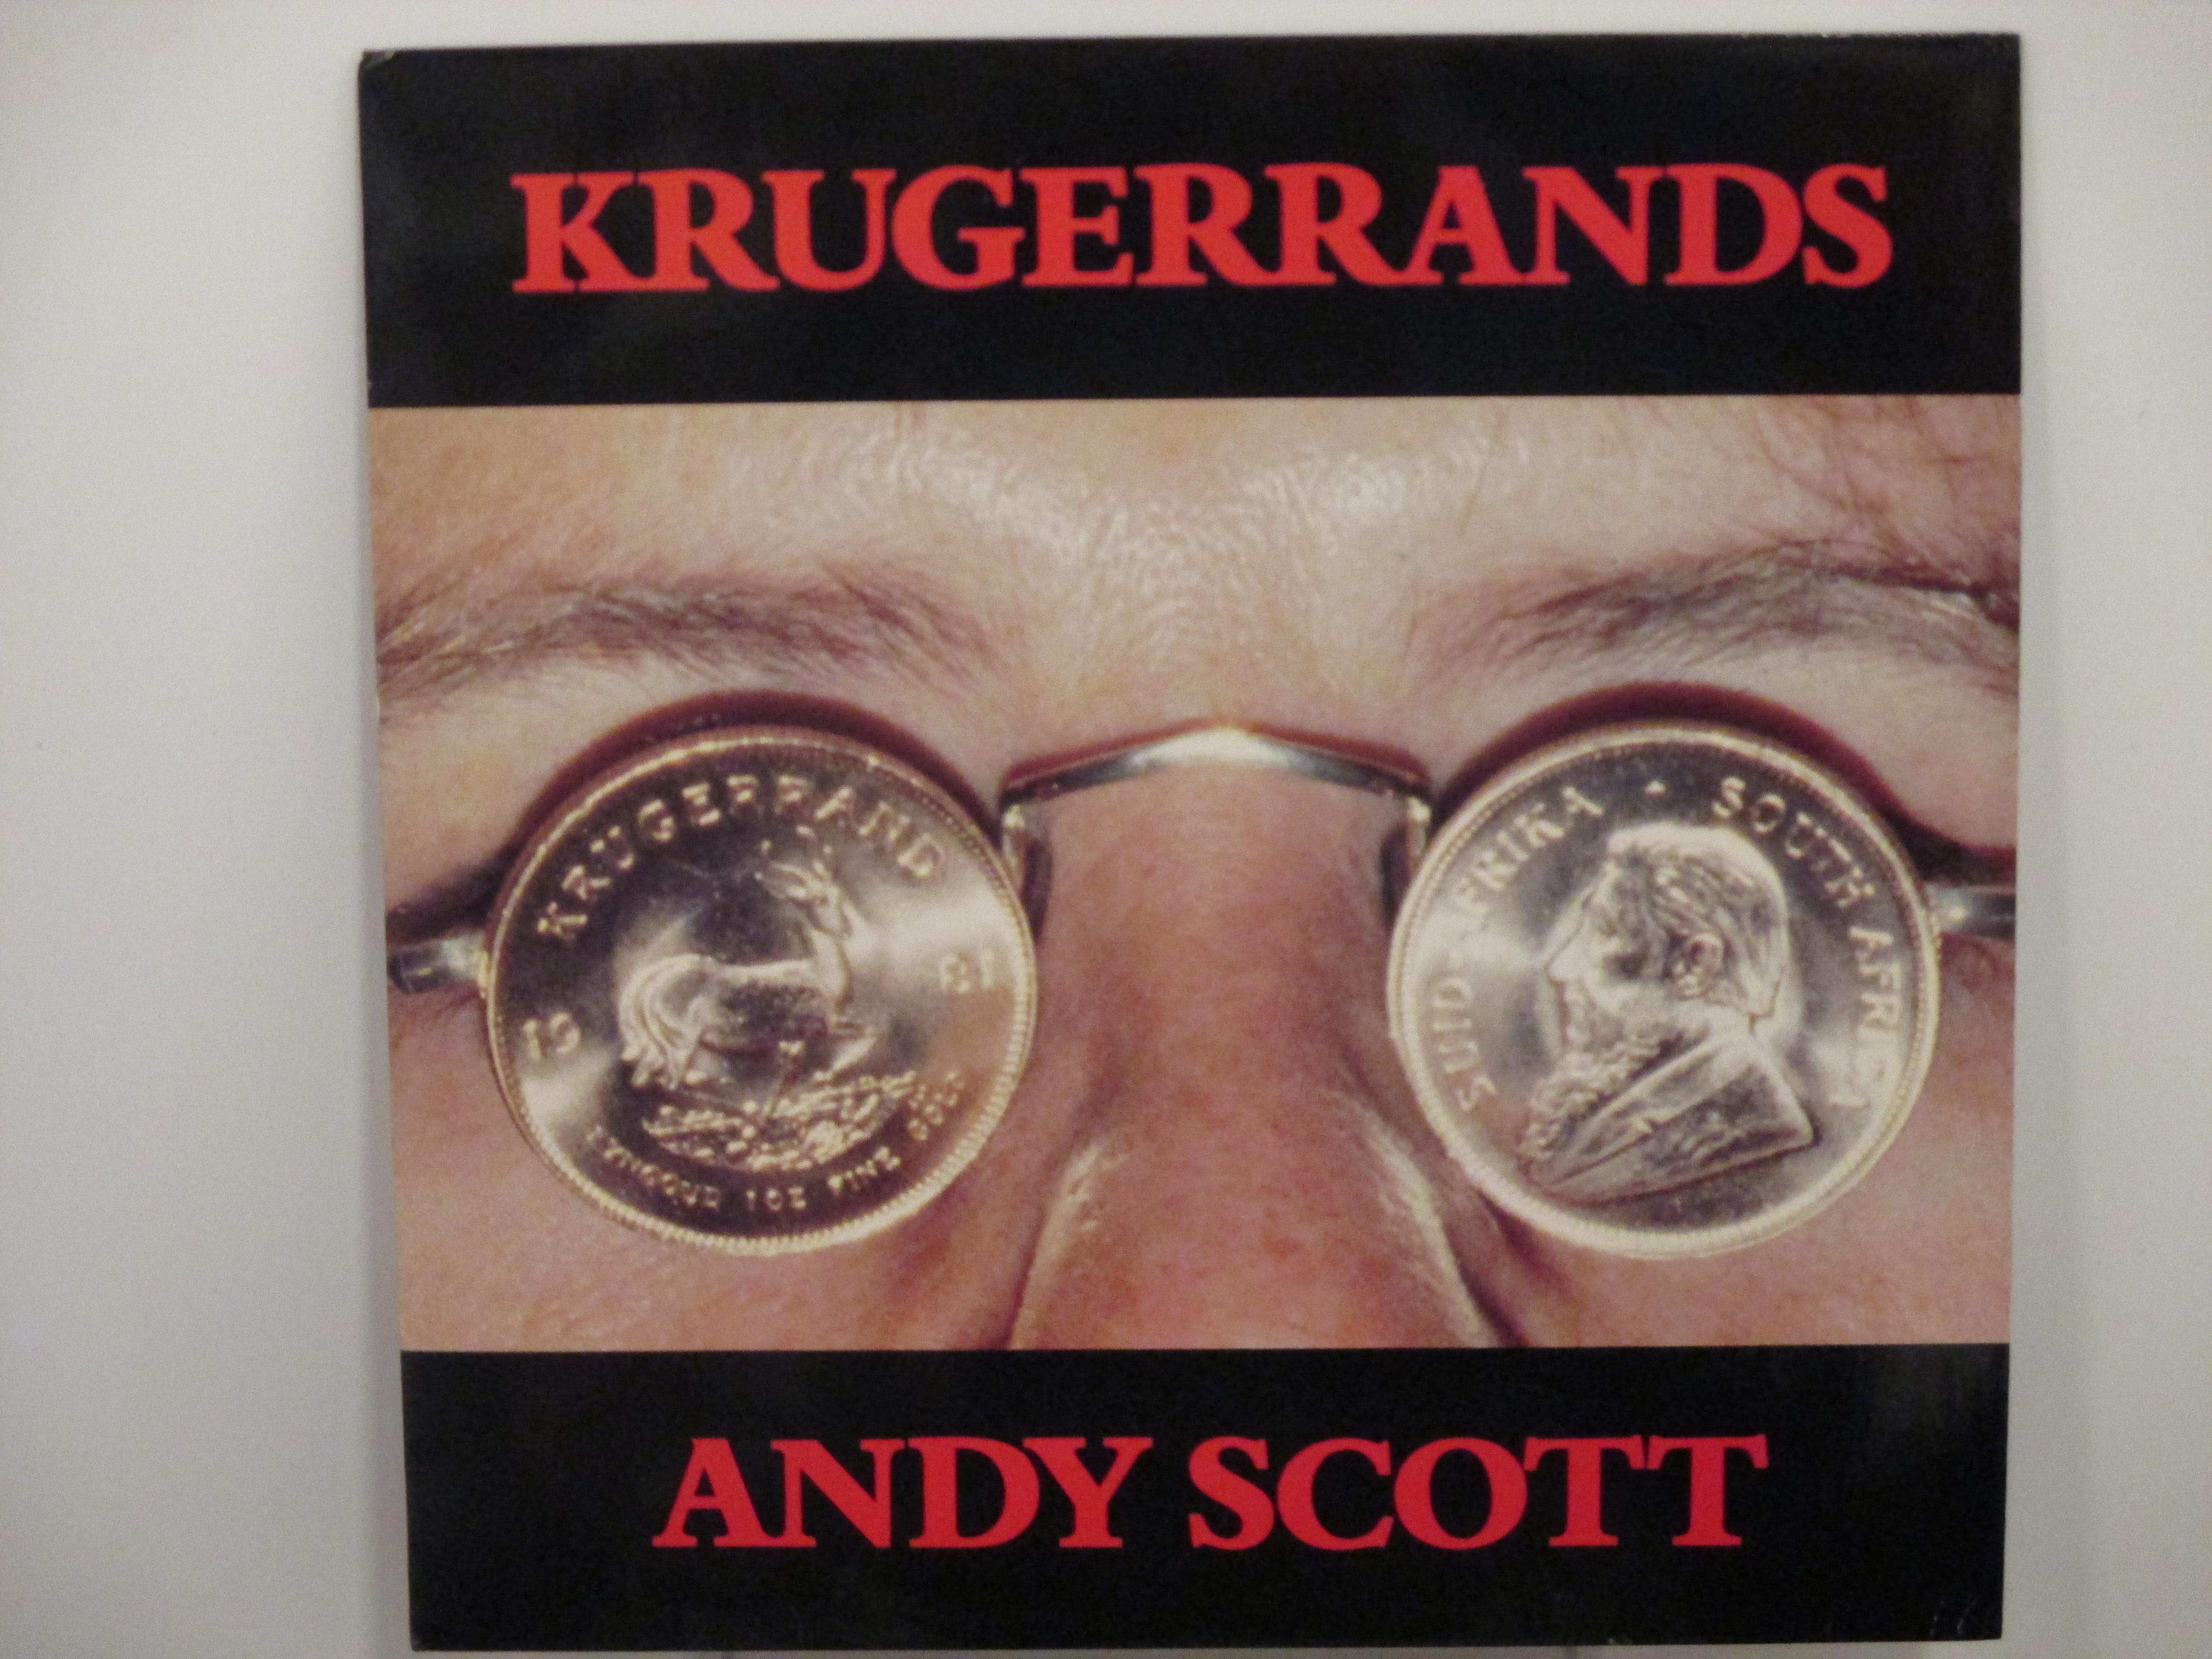 ANDY SCOTT (of SWEET) : Krugerrands / Face